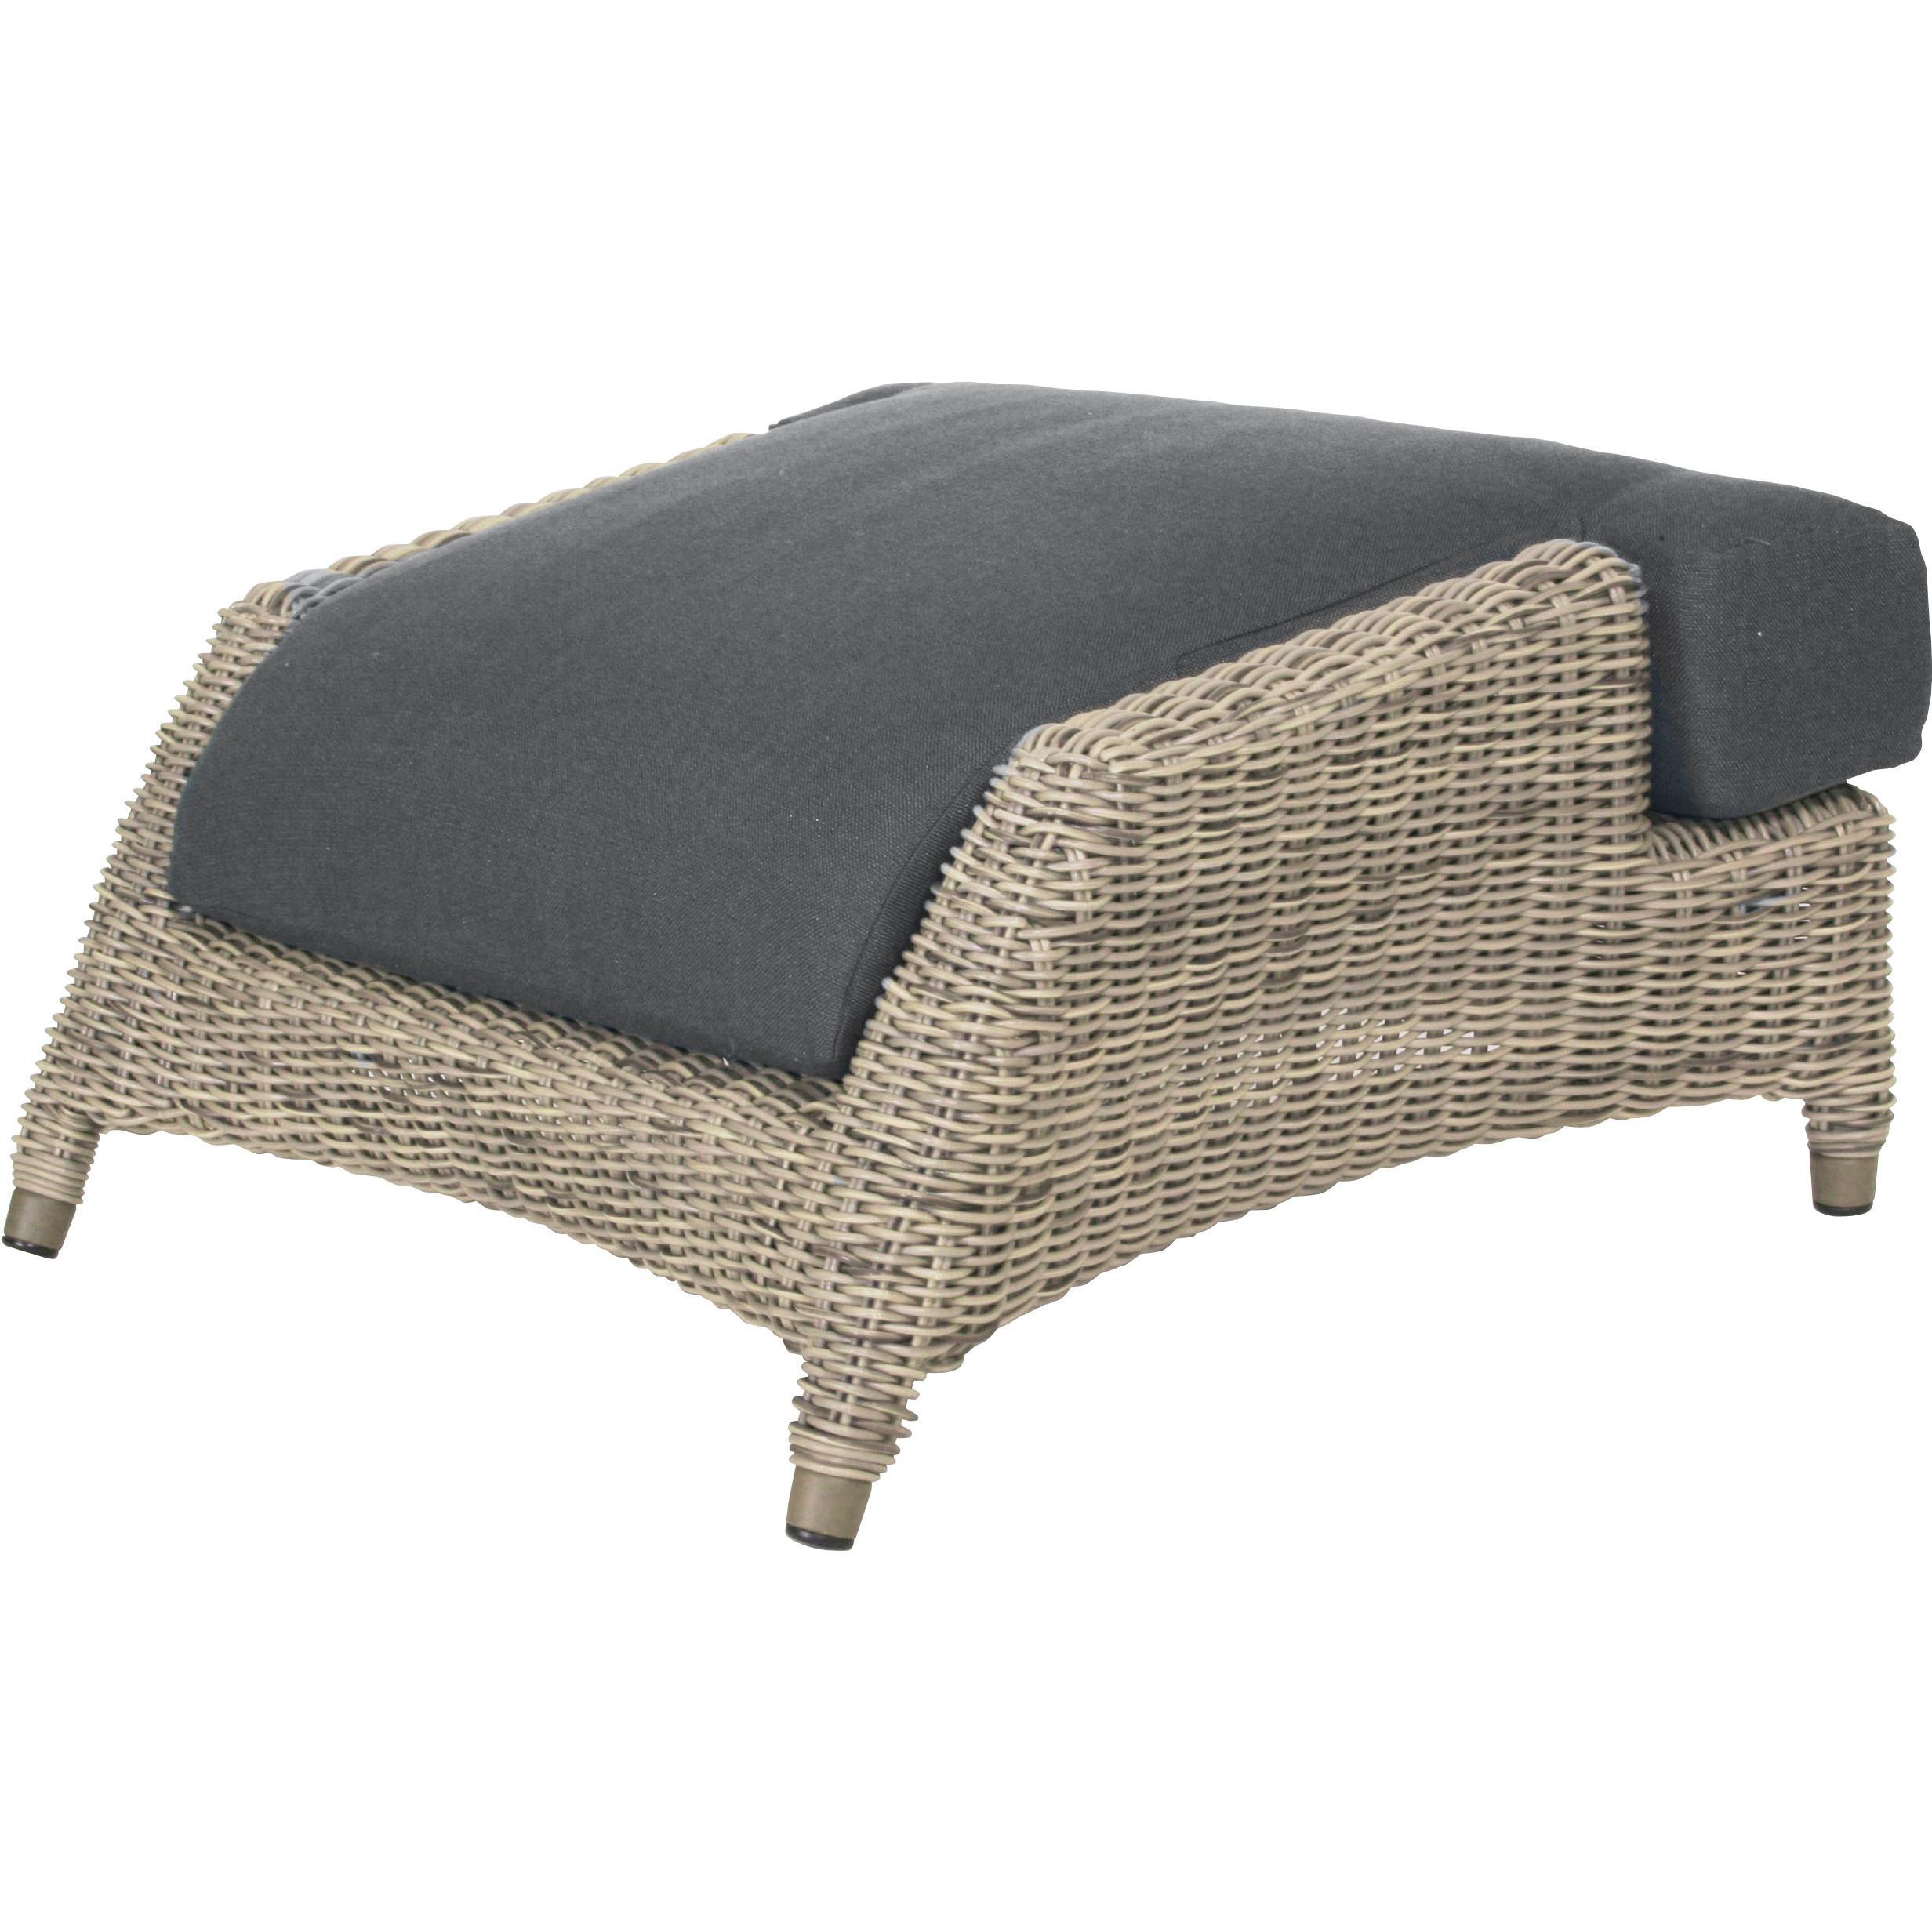 4seasons valentine fu hocker pure inkl kissen online kaufen beckhuis. Black Bedroom Furniture Sets. Home Design Ideas